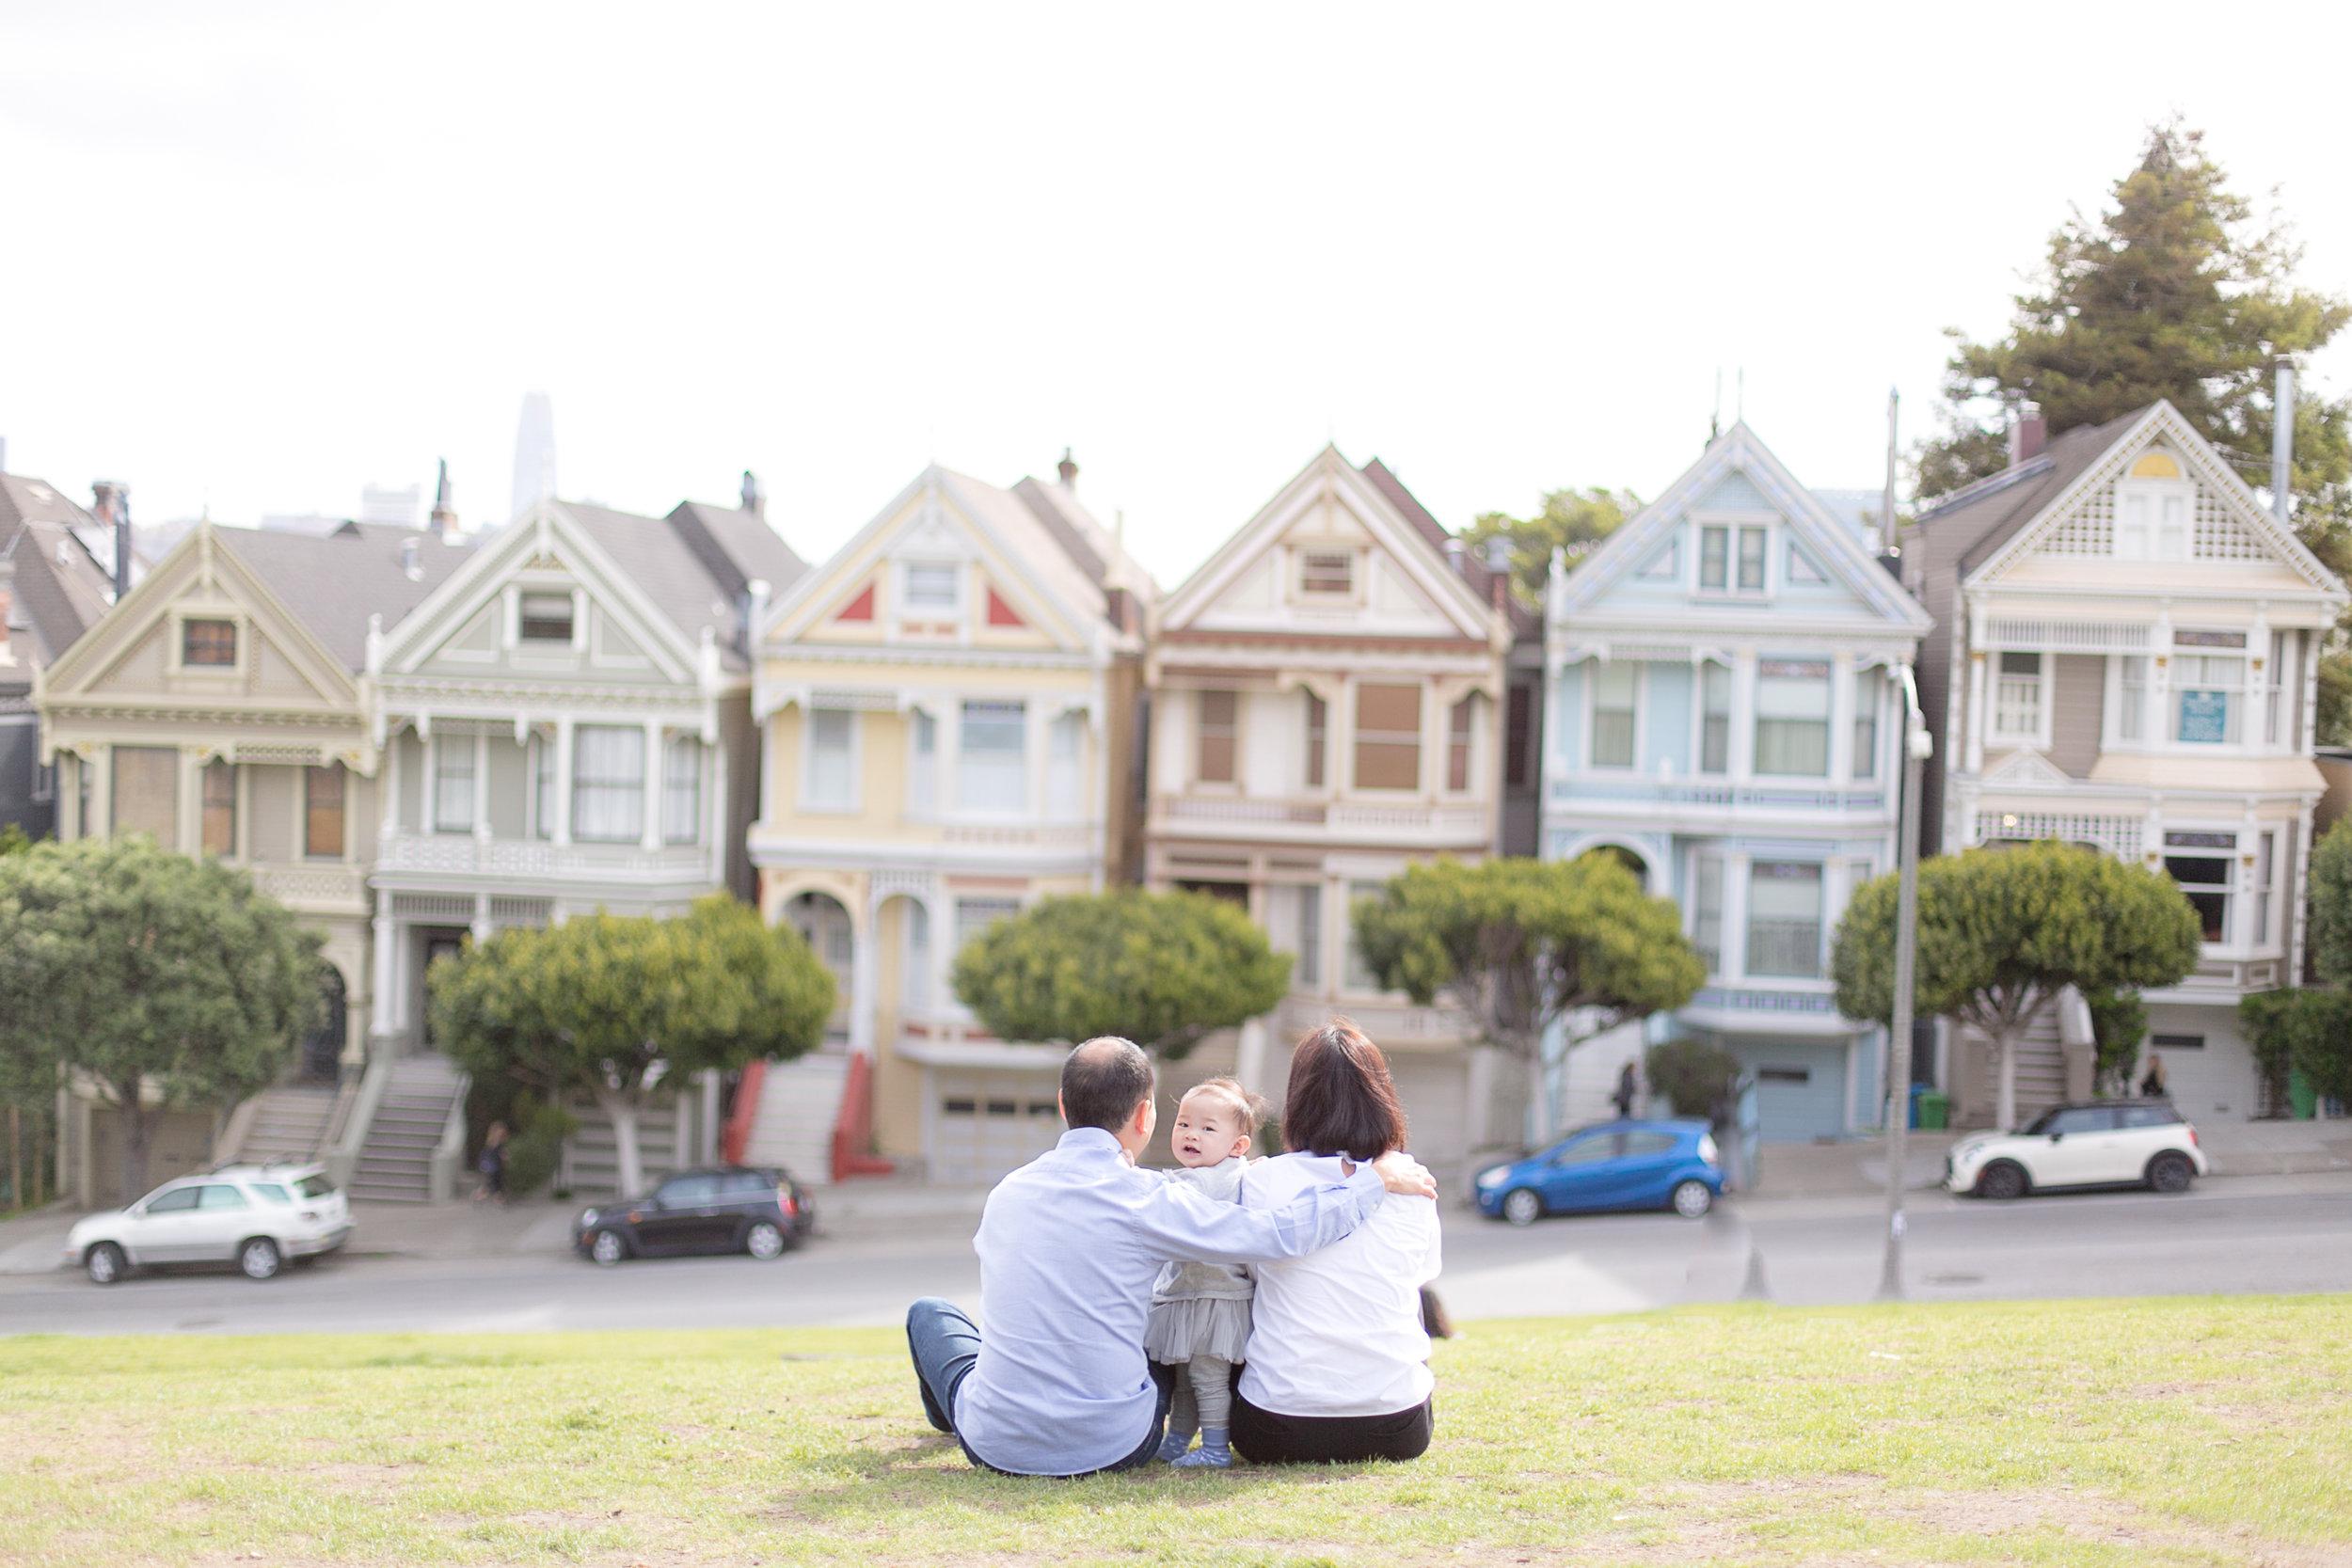 San_Francisco_Children_and_Family_Portrait_005.jpg